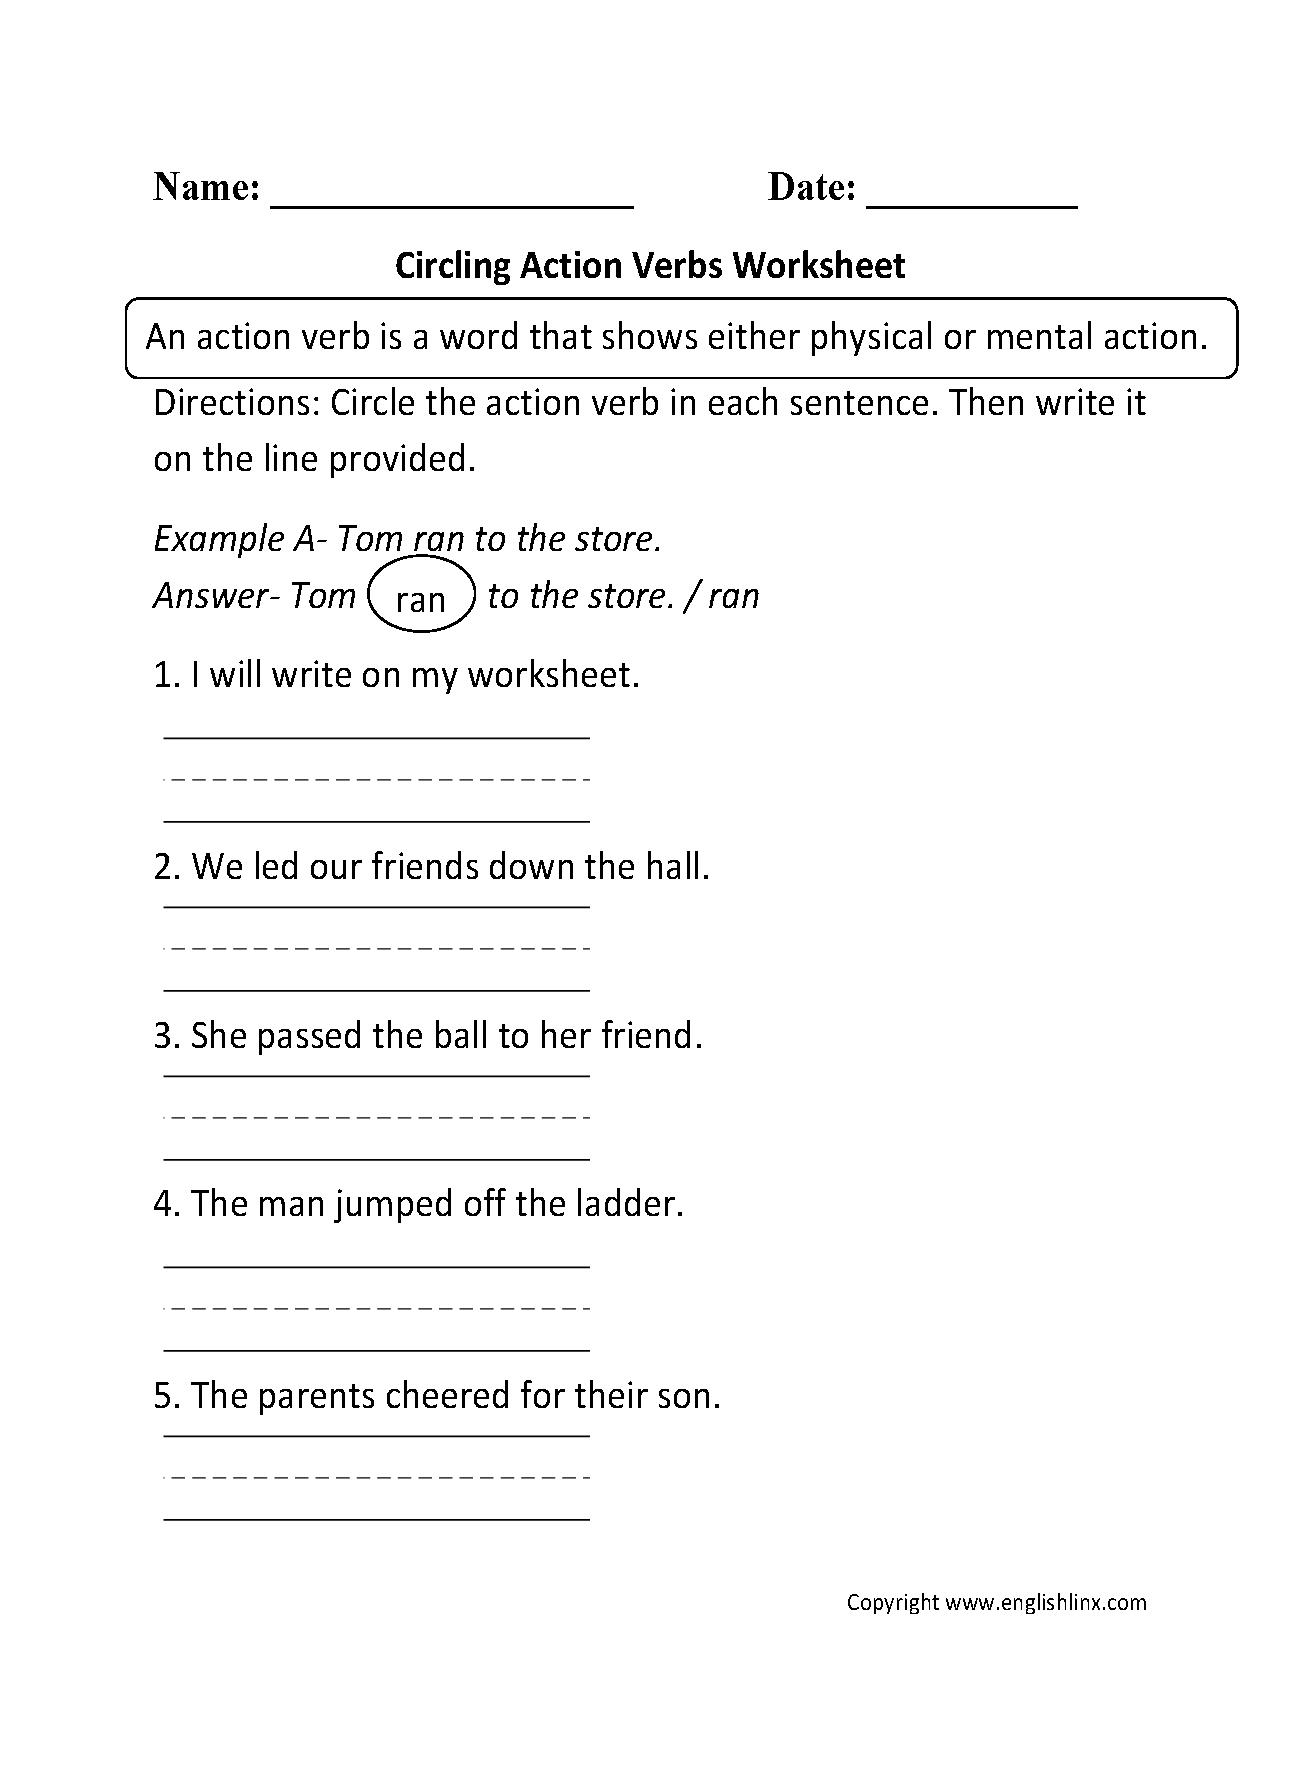 Circling Action Verbs Worksheet Mrs Martinez Verb